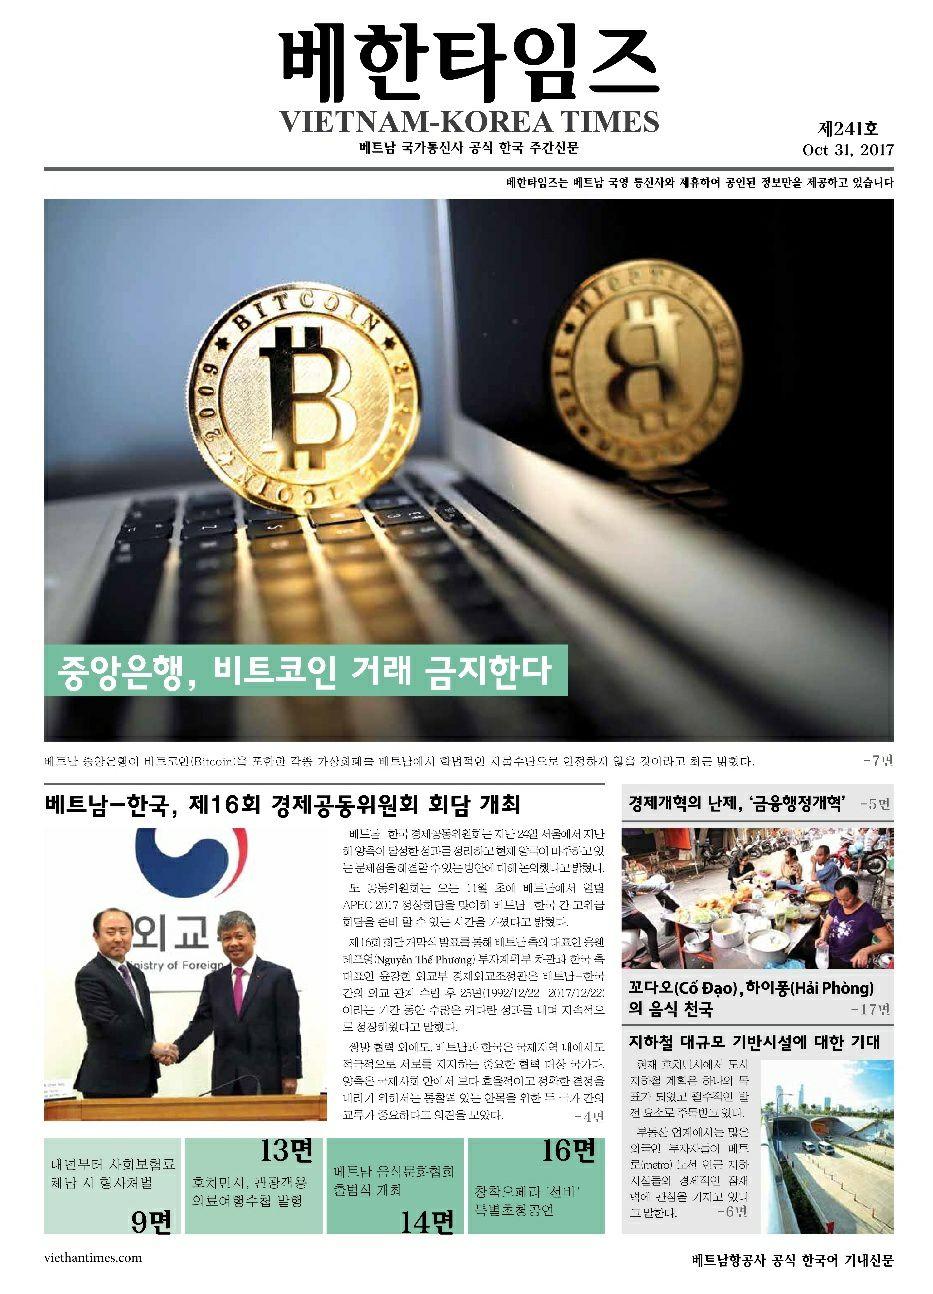 Trang bìa Vietnam-Korea Times - Hotel Briefing Blog